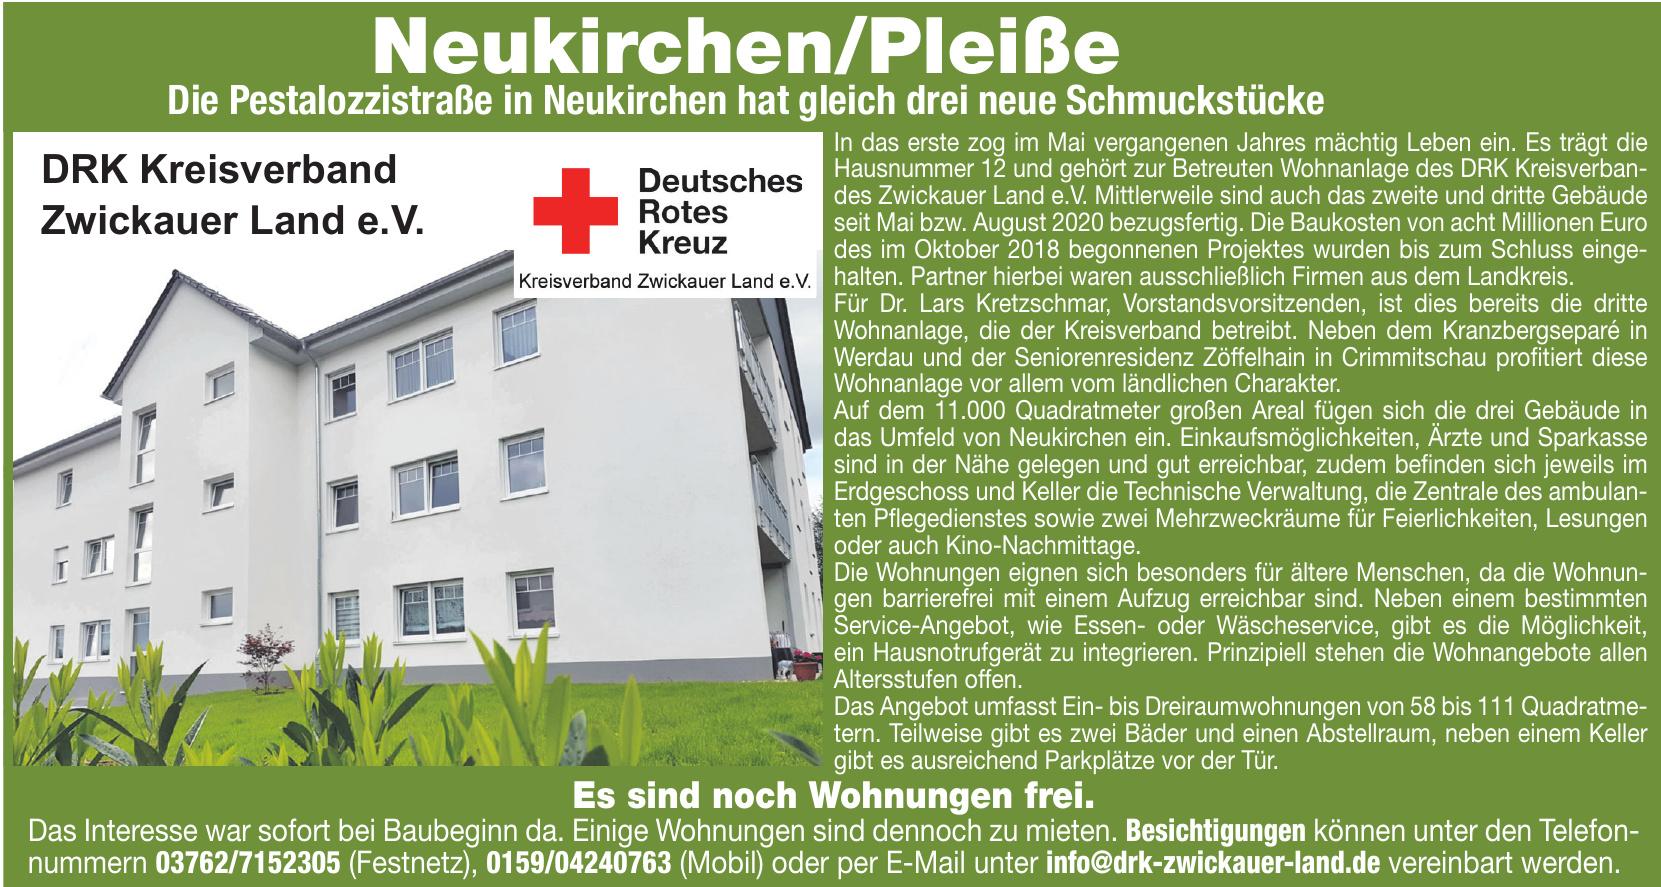 DRK Kreisverband Zwickauer Land e.V.